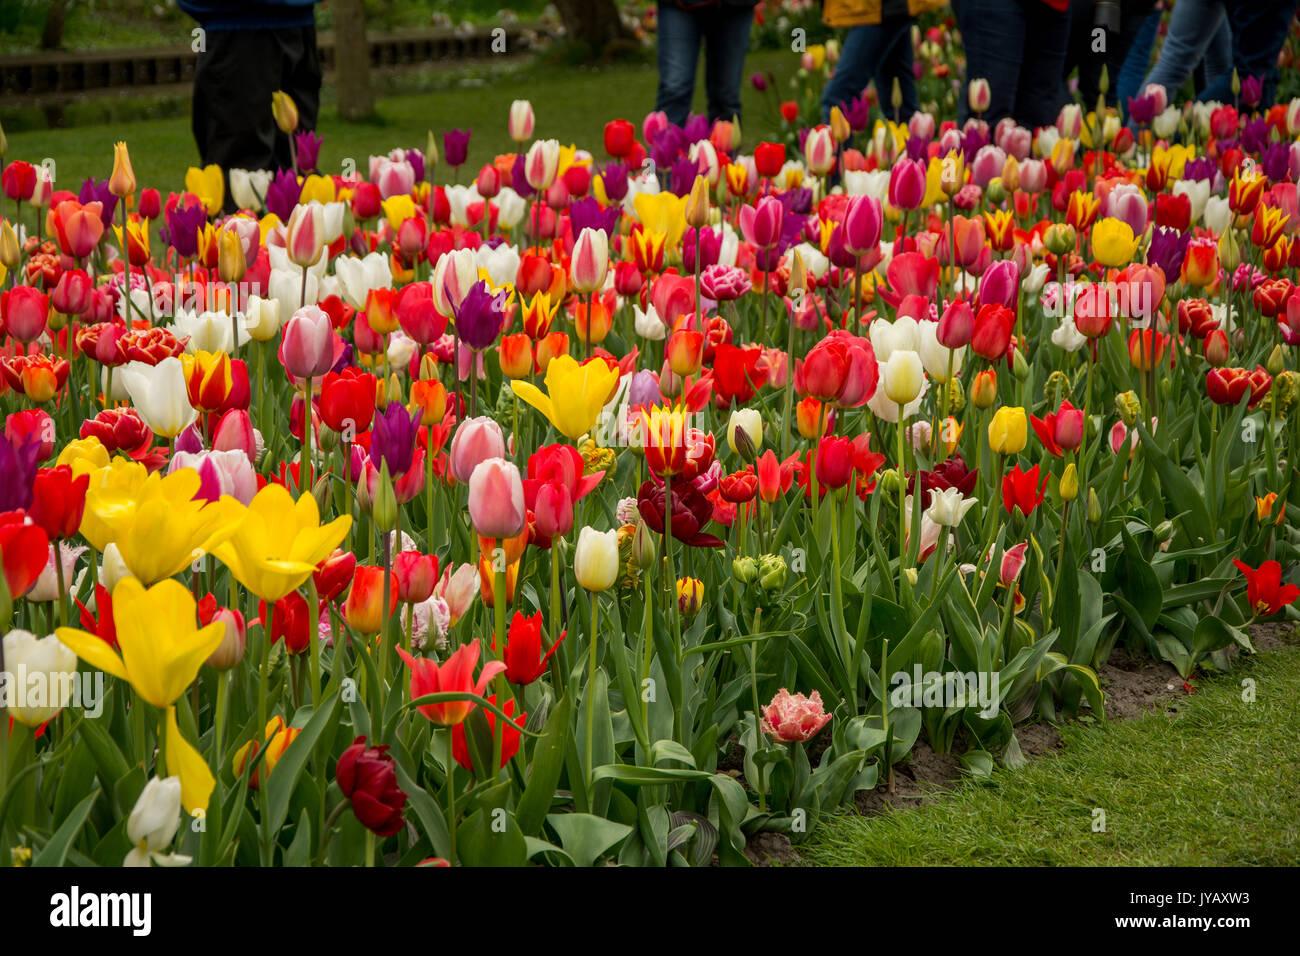 tulips park in amsterdam netherlands stockfotos tulips park in amsterdam netherlands bilder. Black Bedroom Furniture Sets. Home Design Ideas